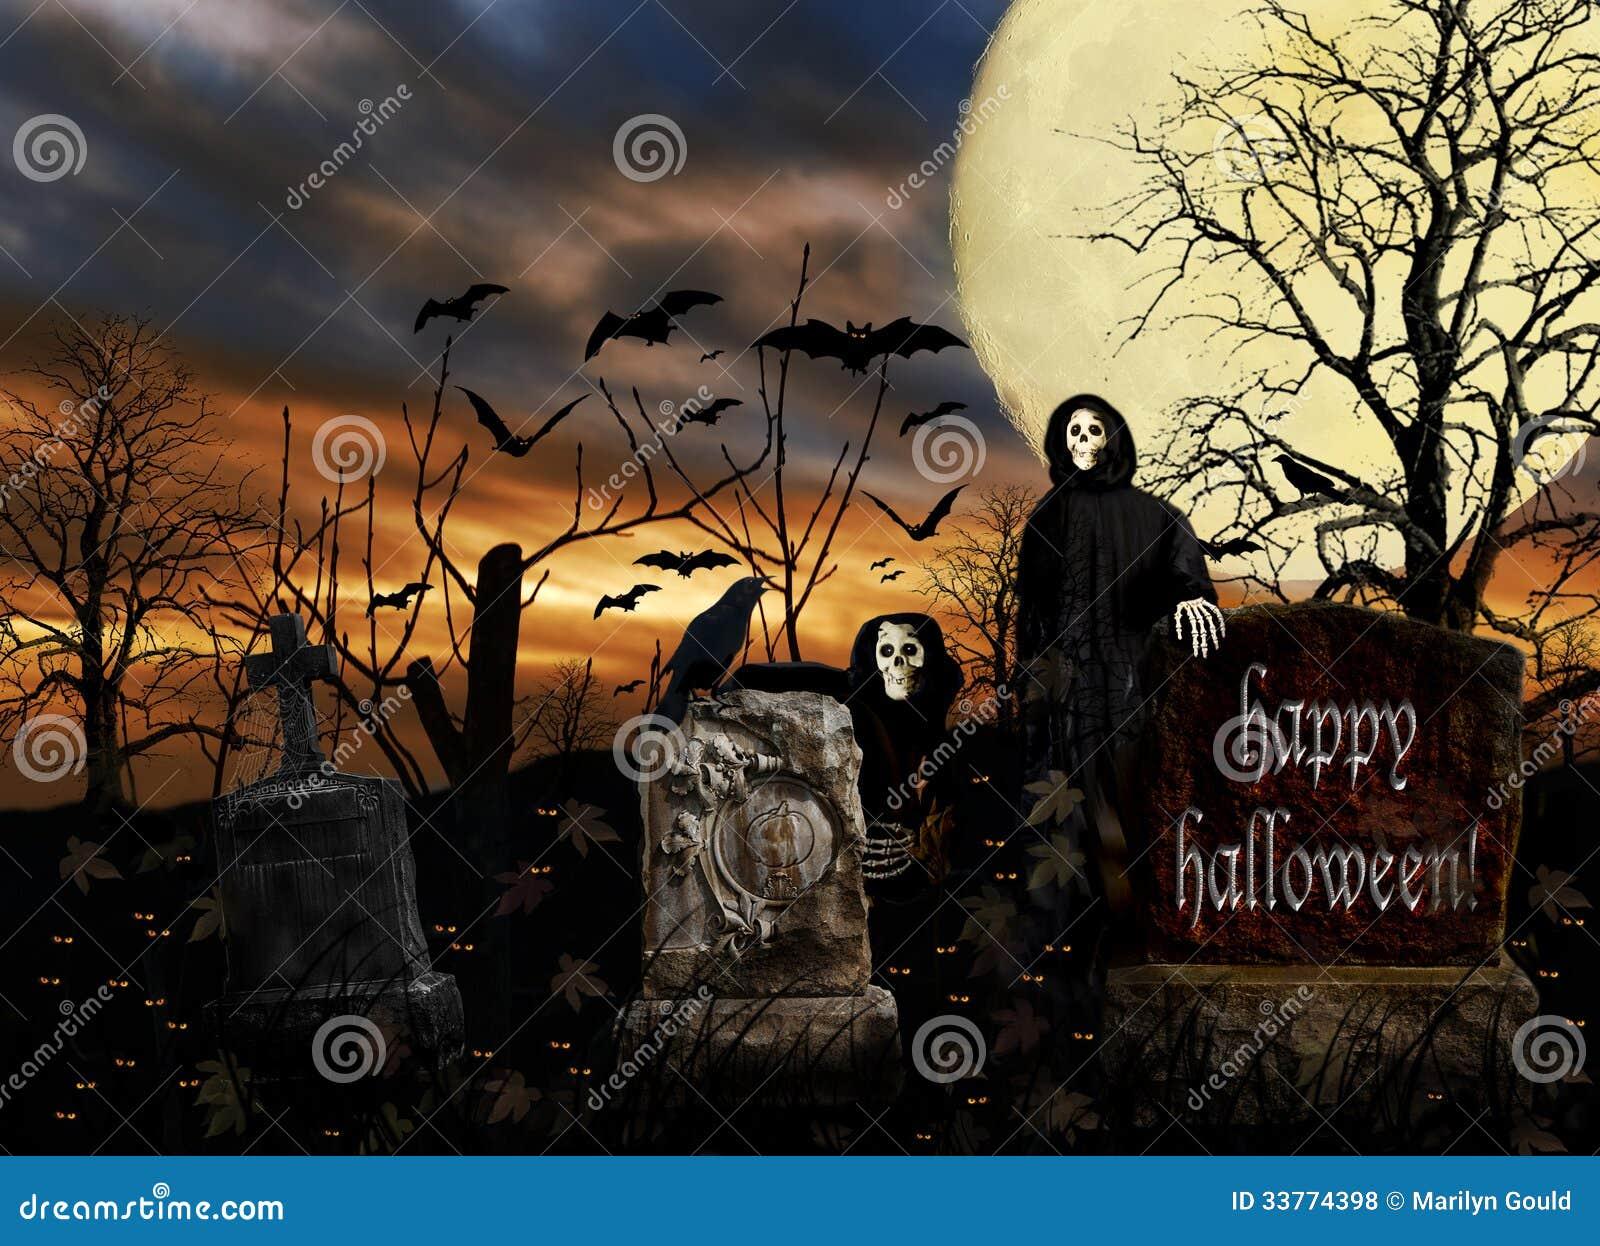 Halloween Ghosts Cemetery Bats Stock Photo Image Of Moon